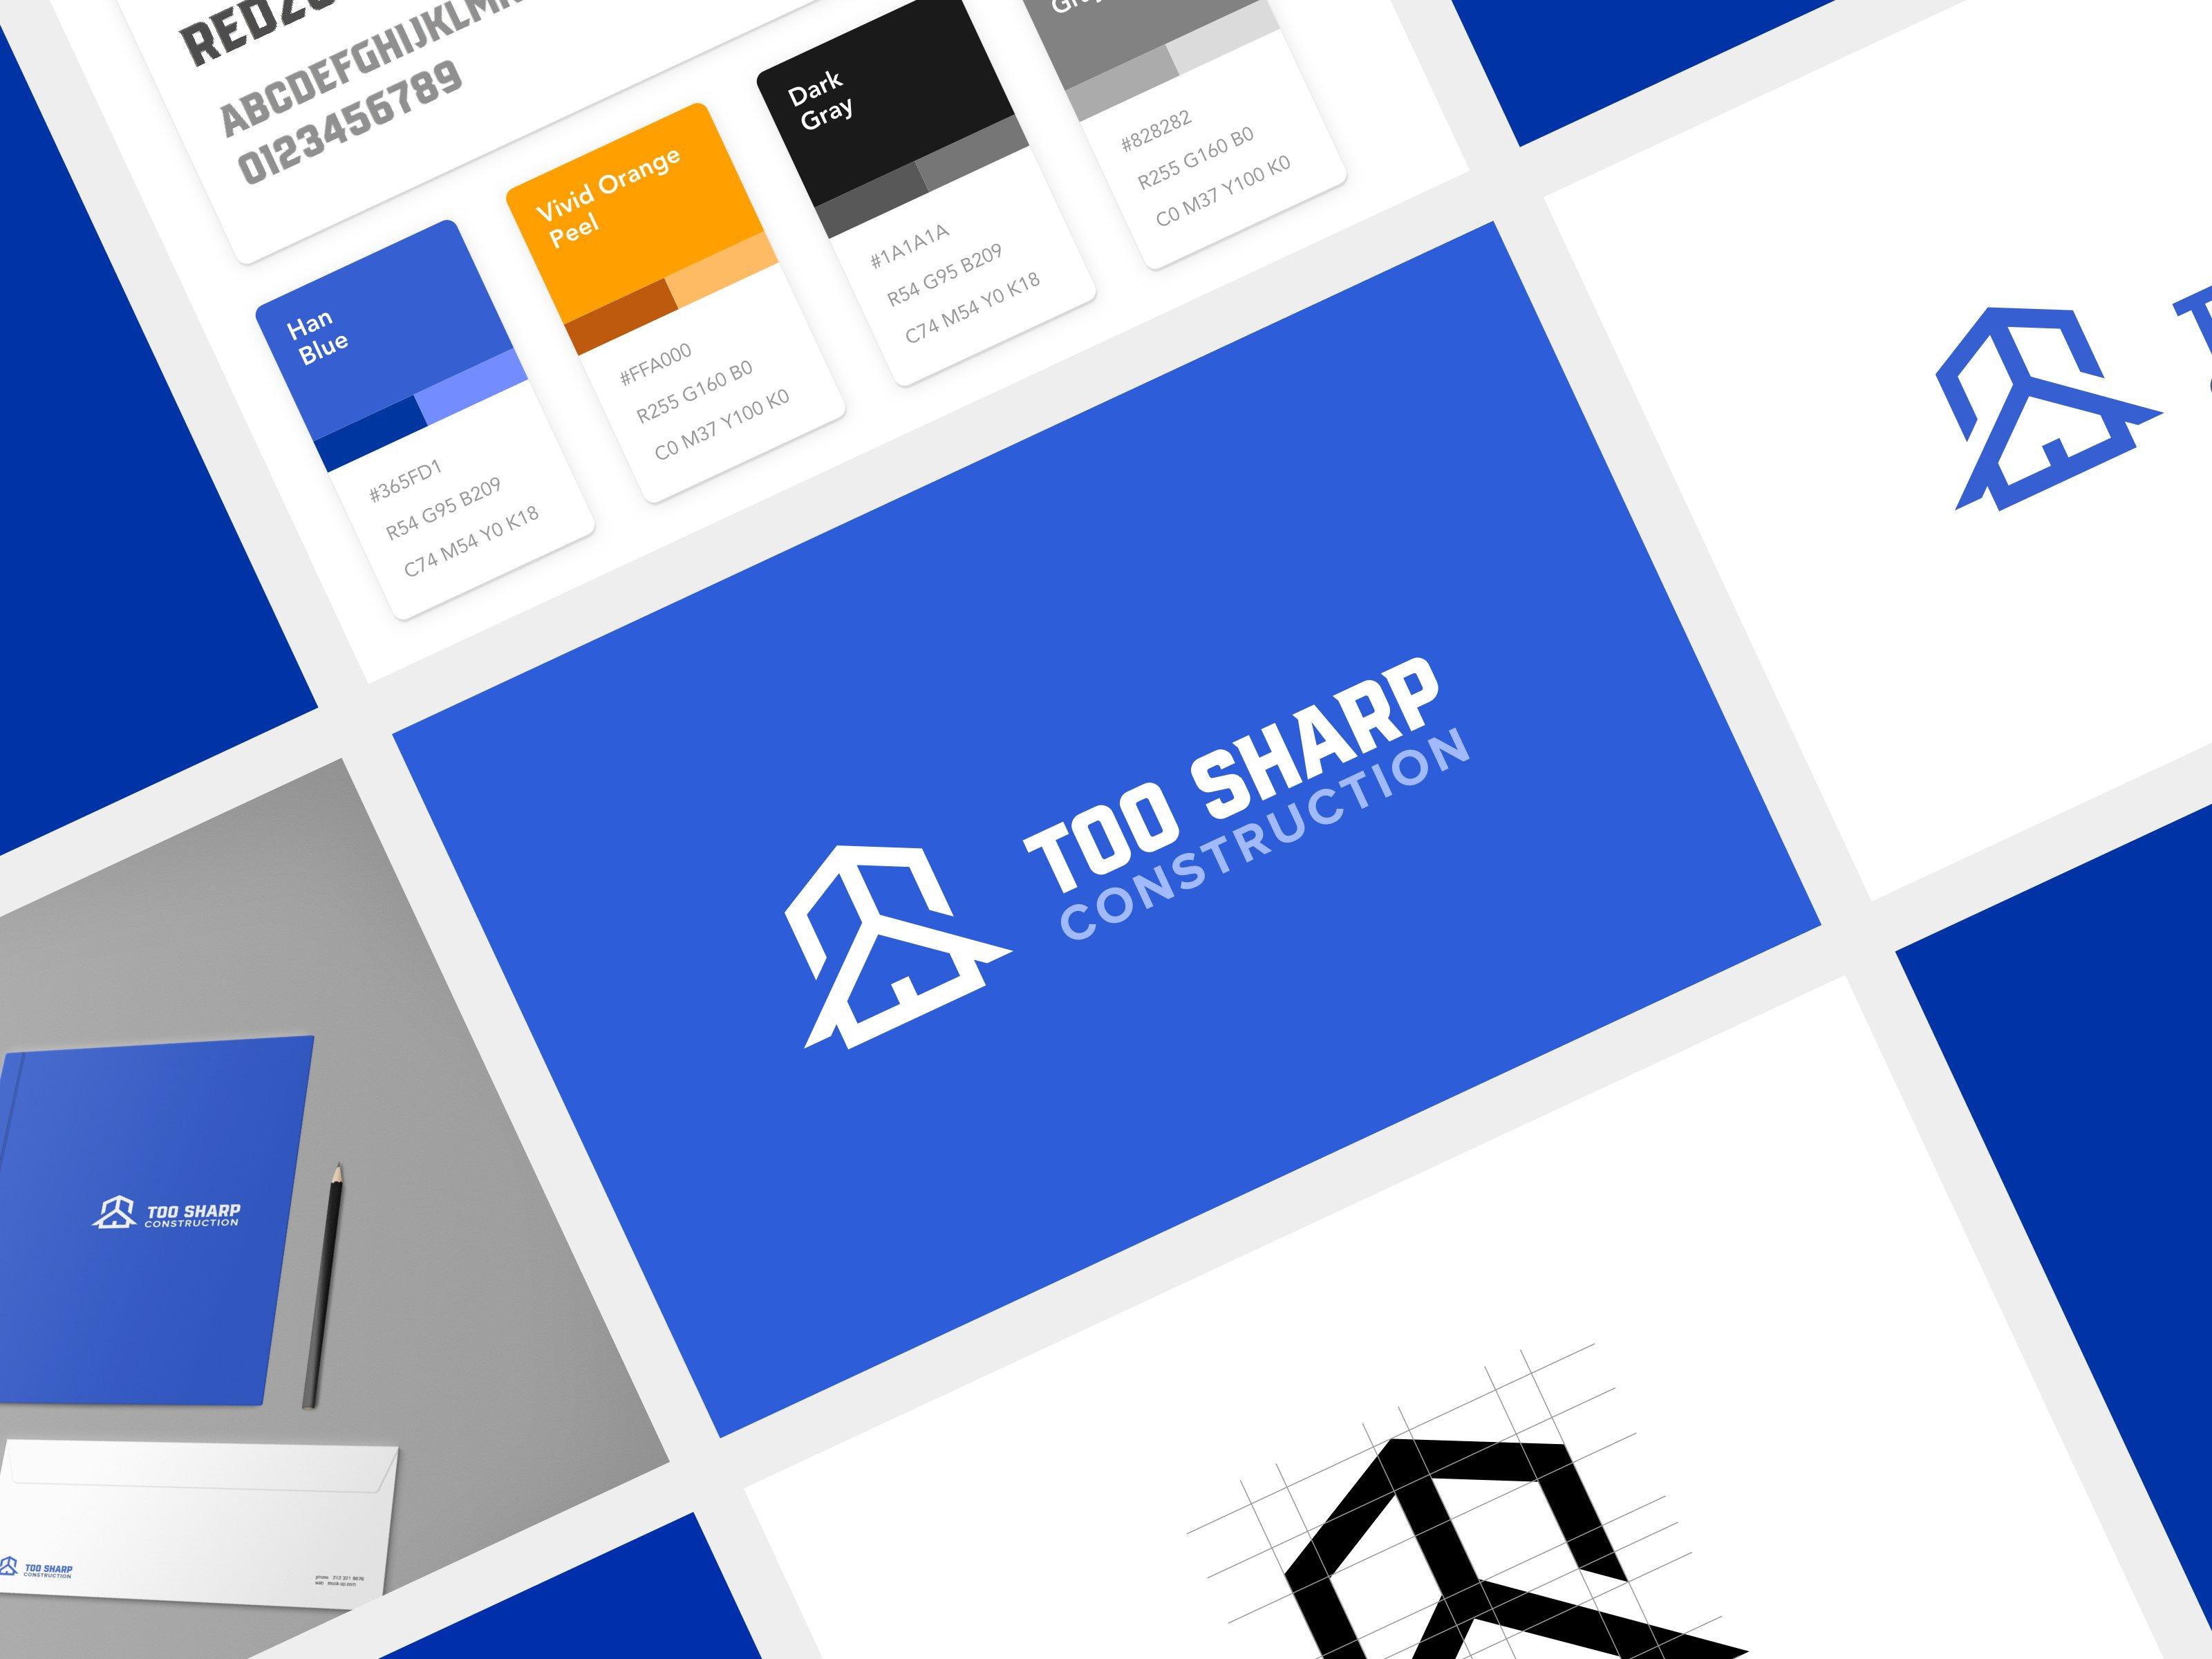 Too Sharp Construction Branding